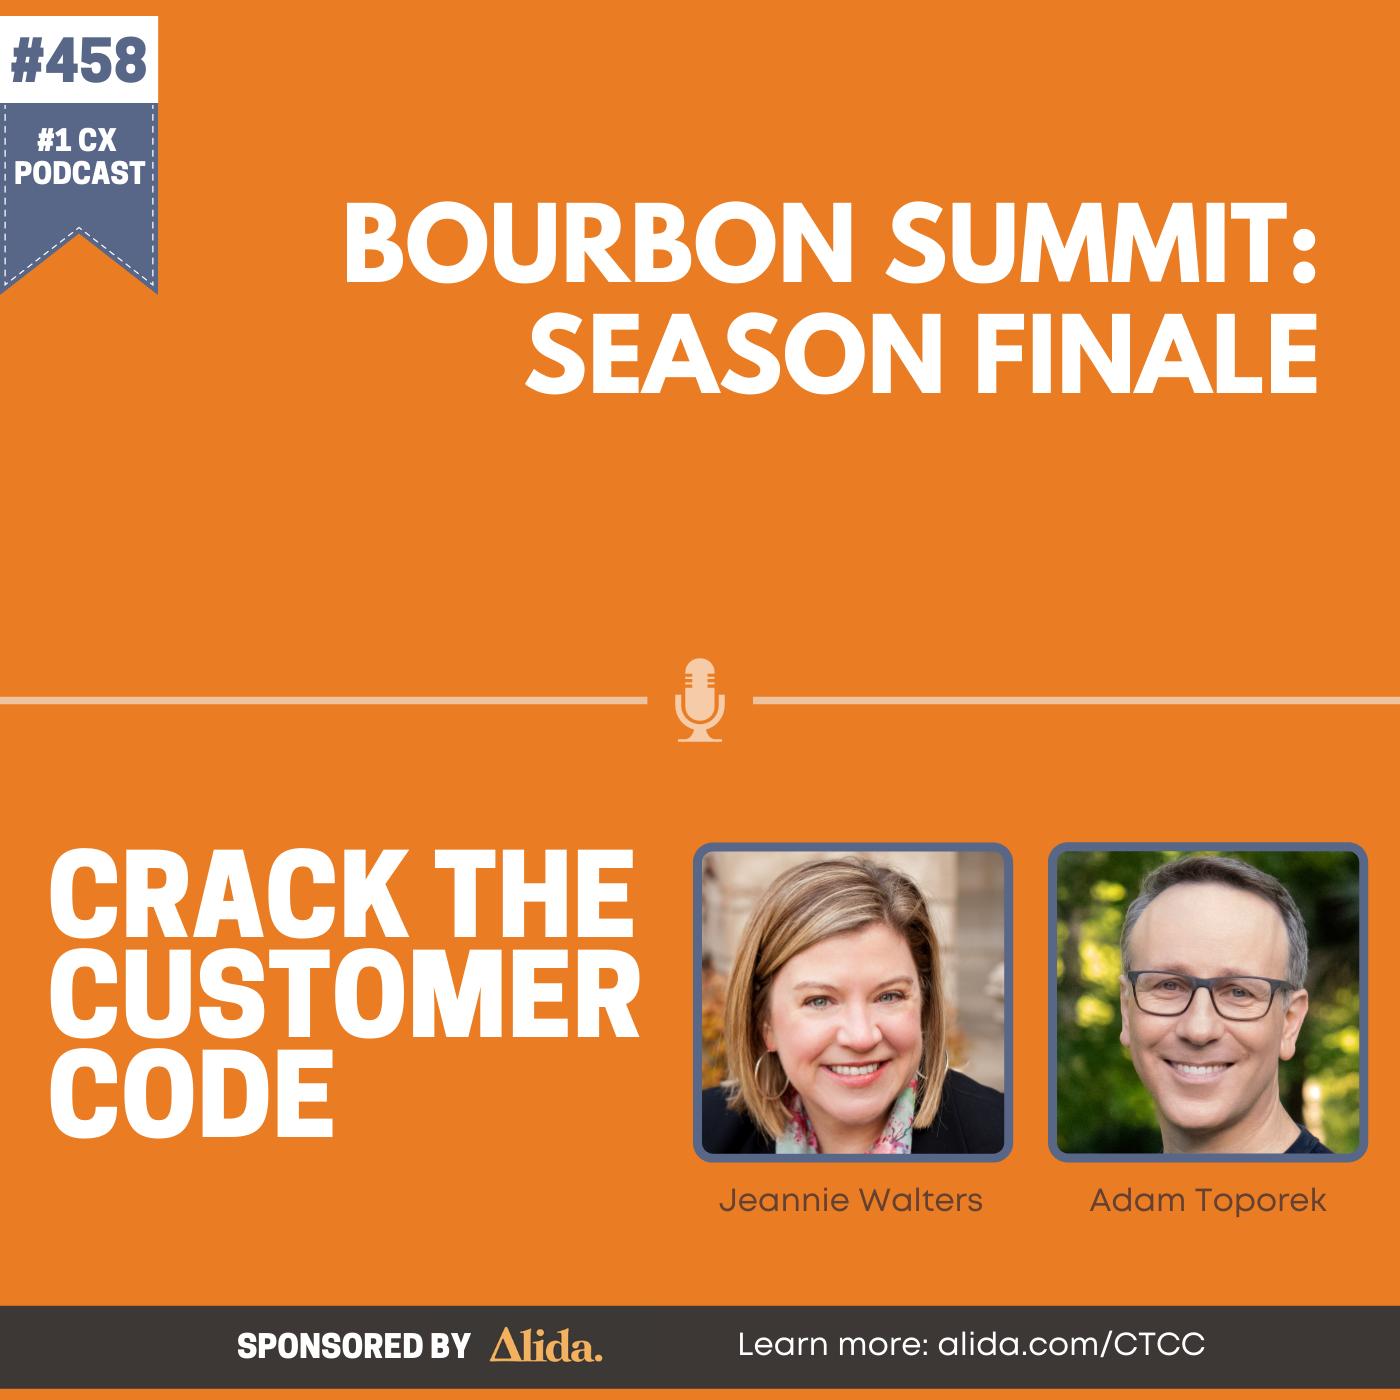 458: Bourbon Summit, Season Finale